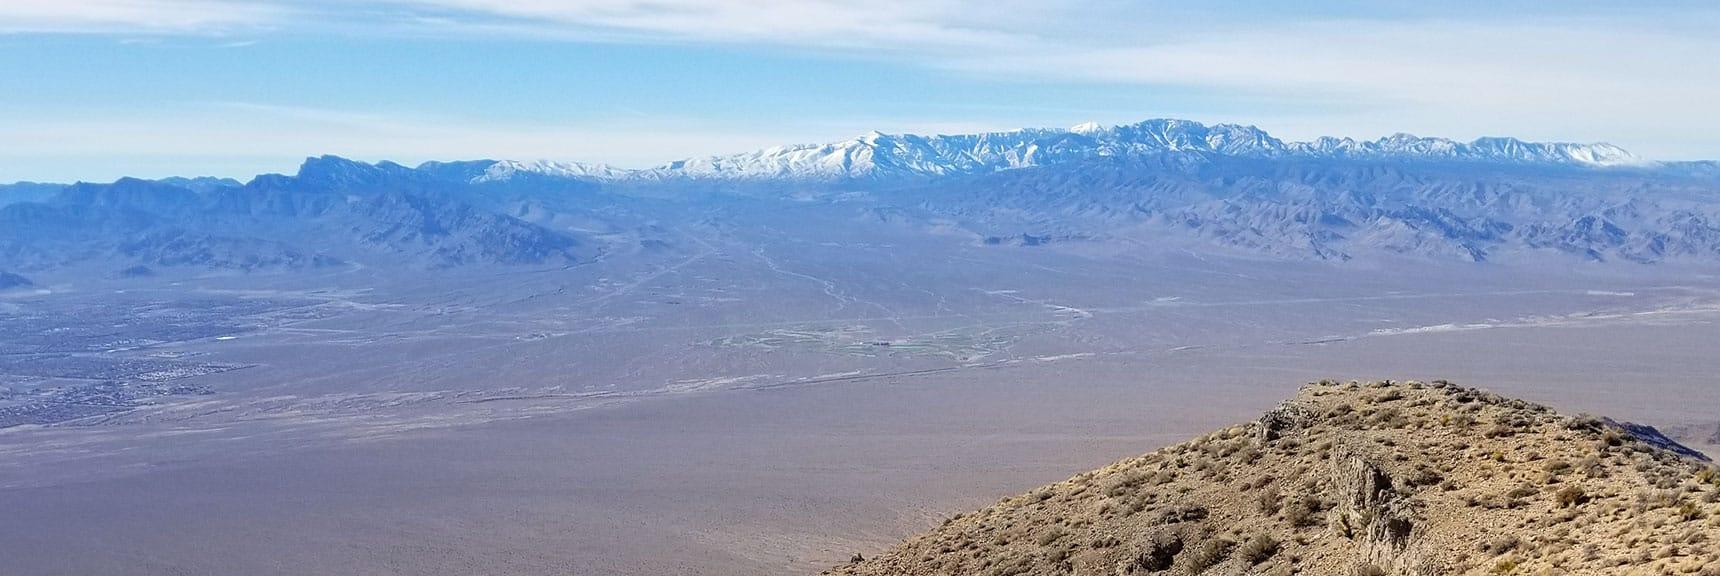 Red Rock Park, La Madre Mt. and Mt. Charleston Wilderness Viewed from Gass Peak Summit, Nevada